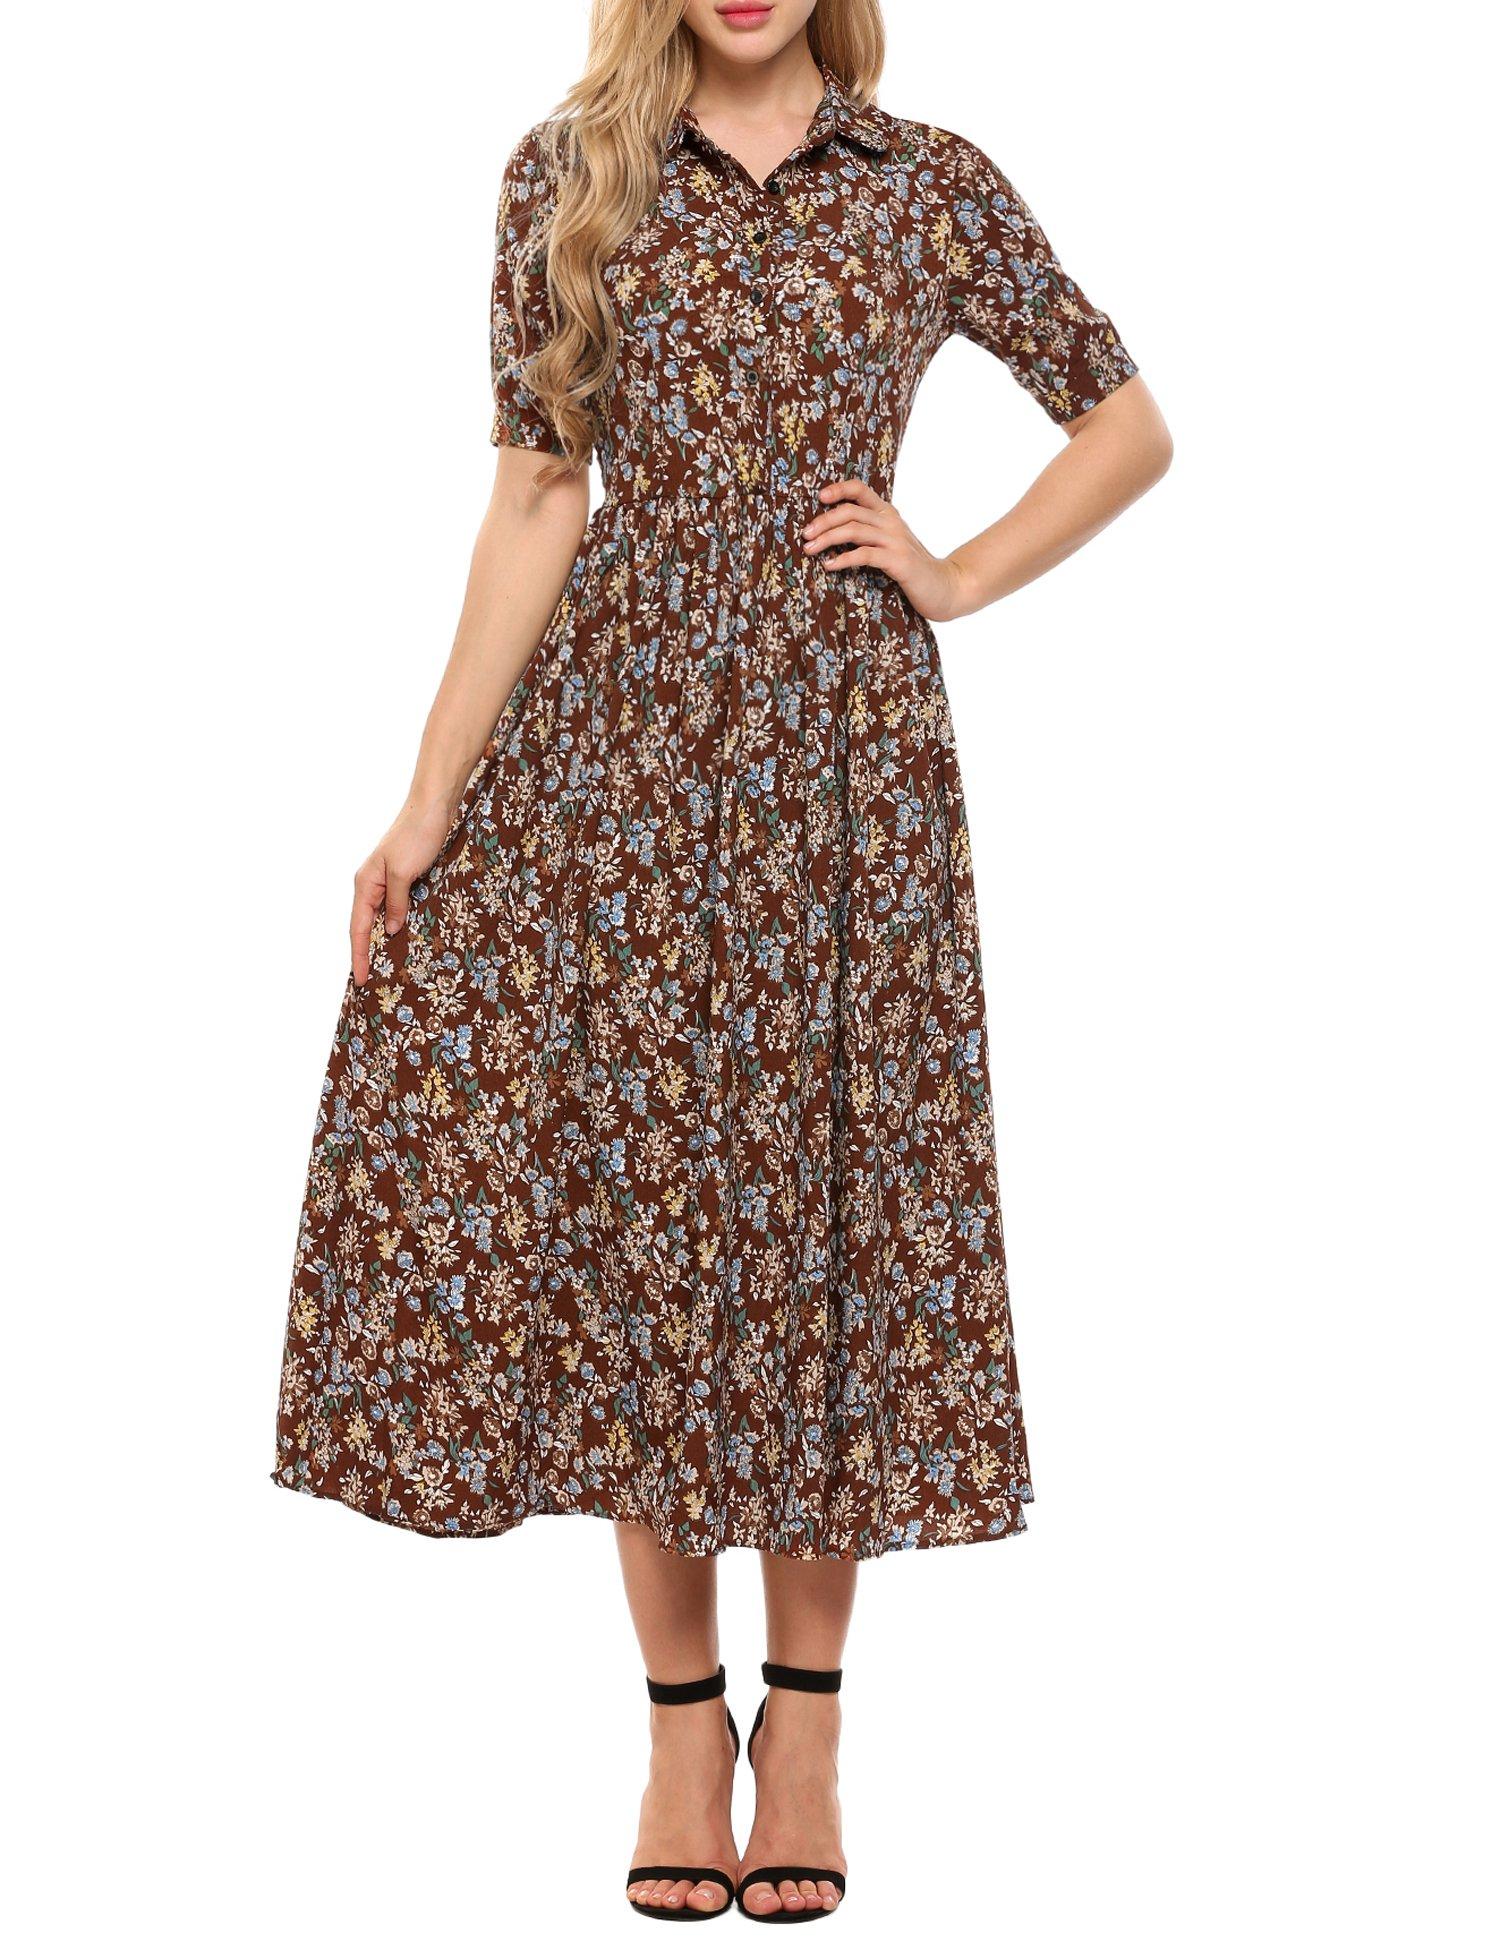 ACEVOG Womens Vintage Style Short Sleeve Floral Print Long Maxi Dress, Brown, Medium